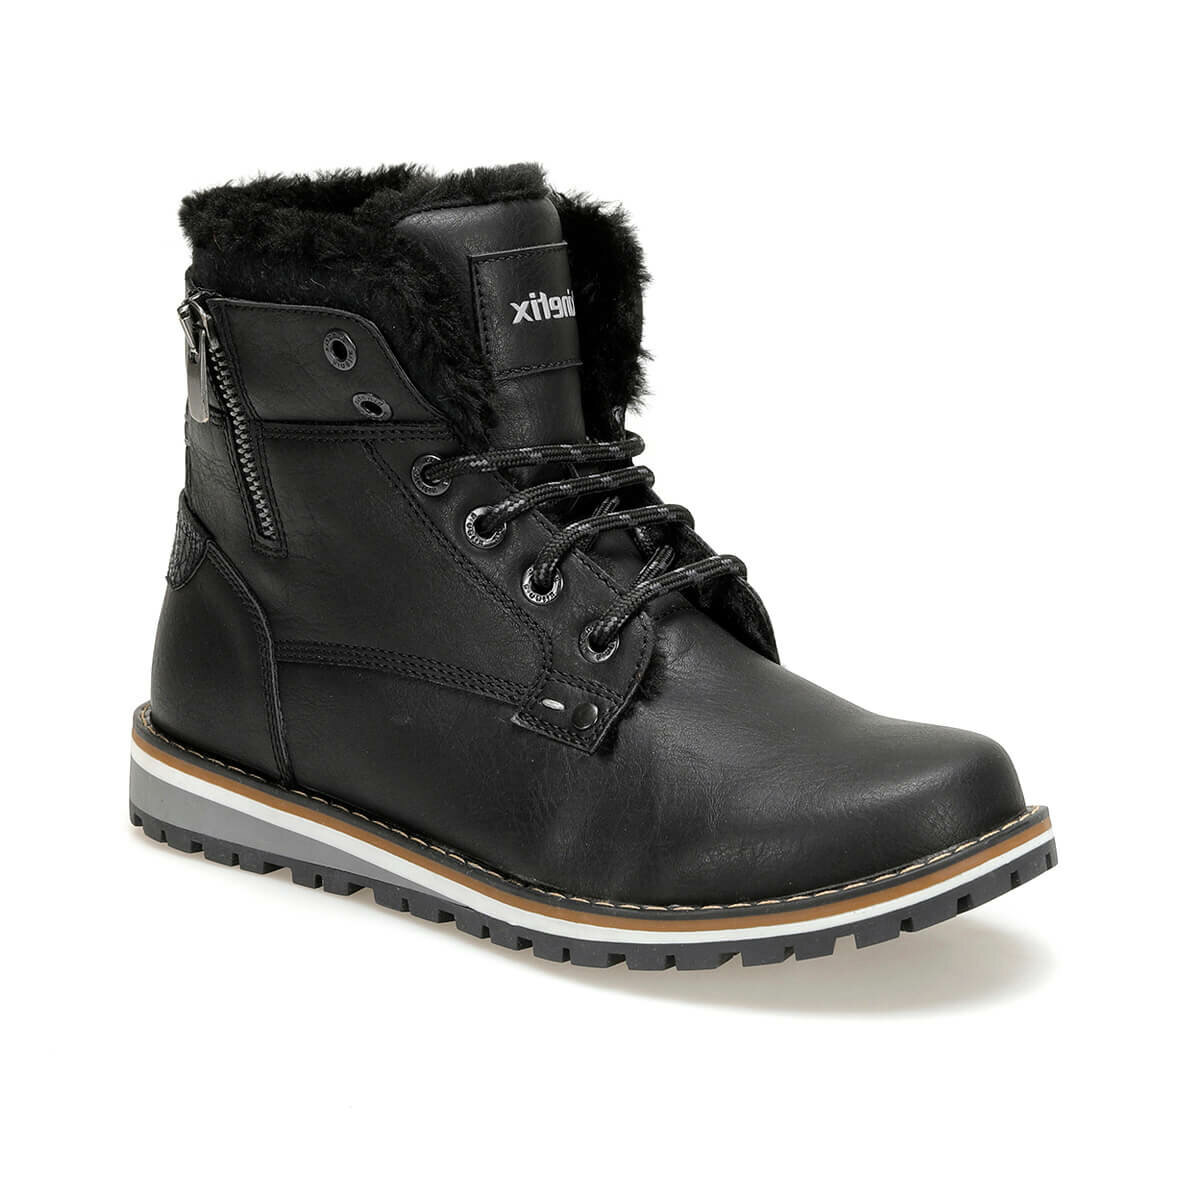 FLO WIND G 9PR Black Male Child Boots KINETIX